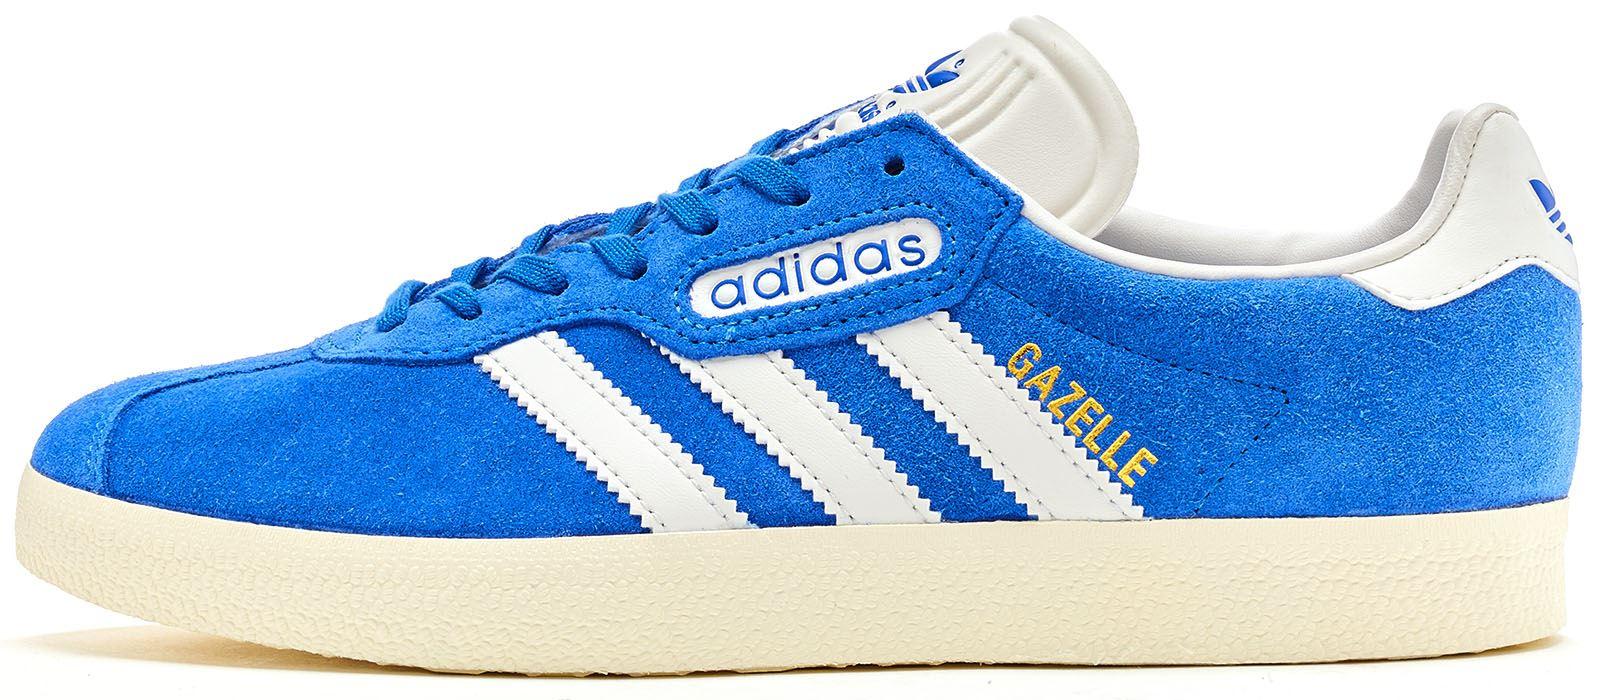 the latest c284b 974da Adidas Originals Gazelle Super Suede Trainers in Blue  Vintage White BB5241